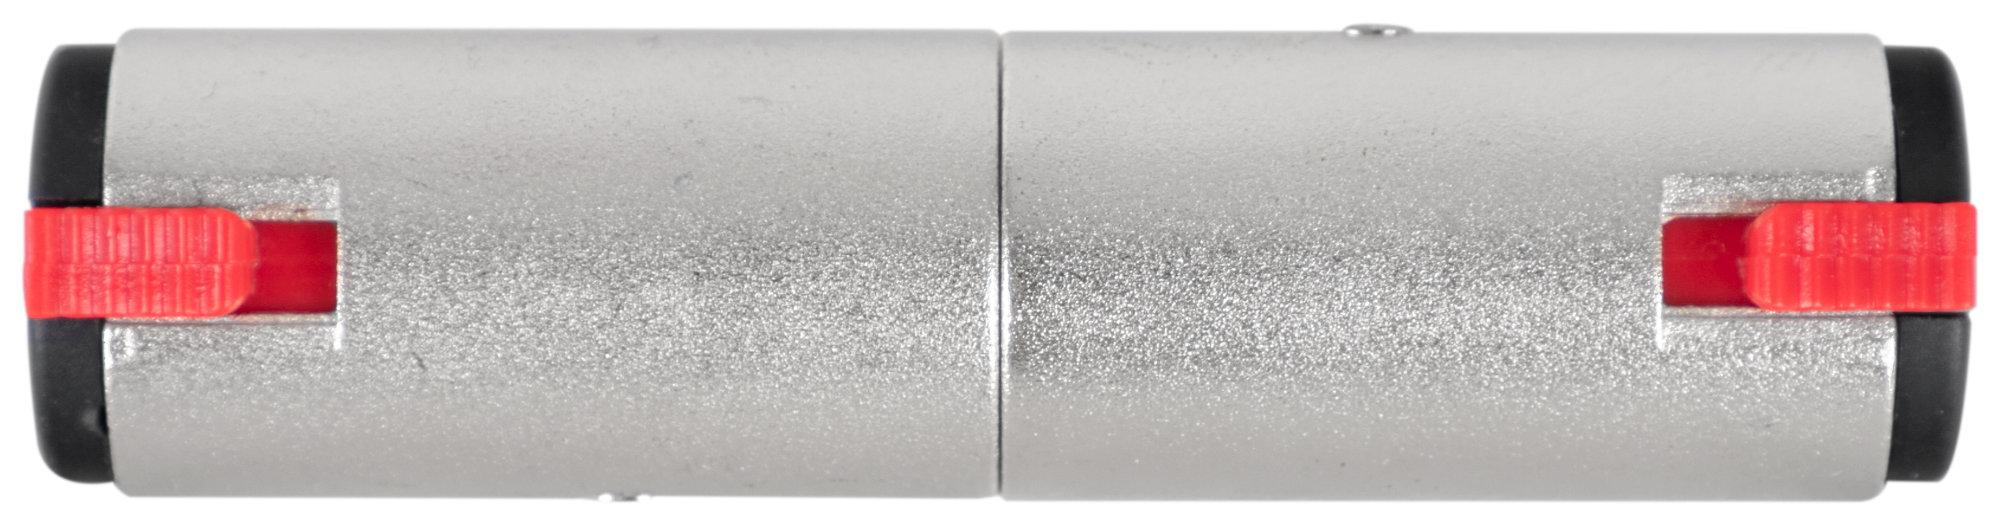 Kabelmulticores - Pronomic AD JFJF Adapter 6,3mm Klinke female | 6,3mm Klinke female - Onlineshop Musikhaus Kirstein